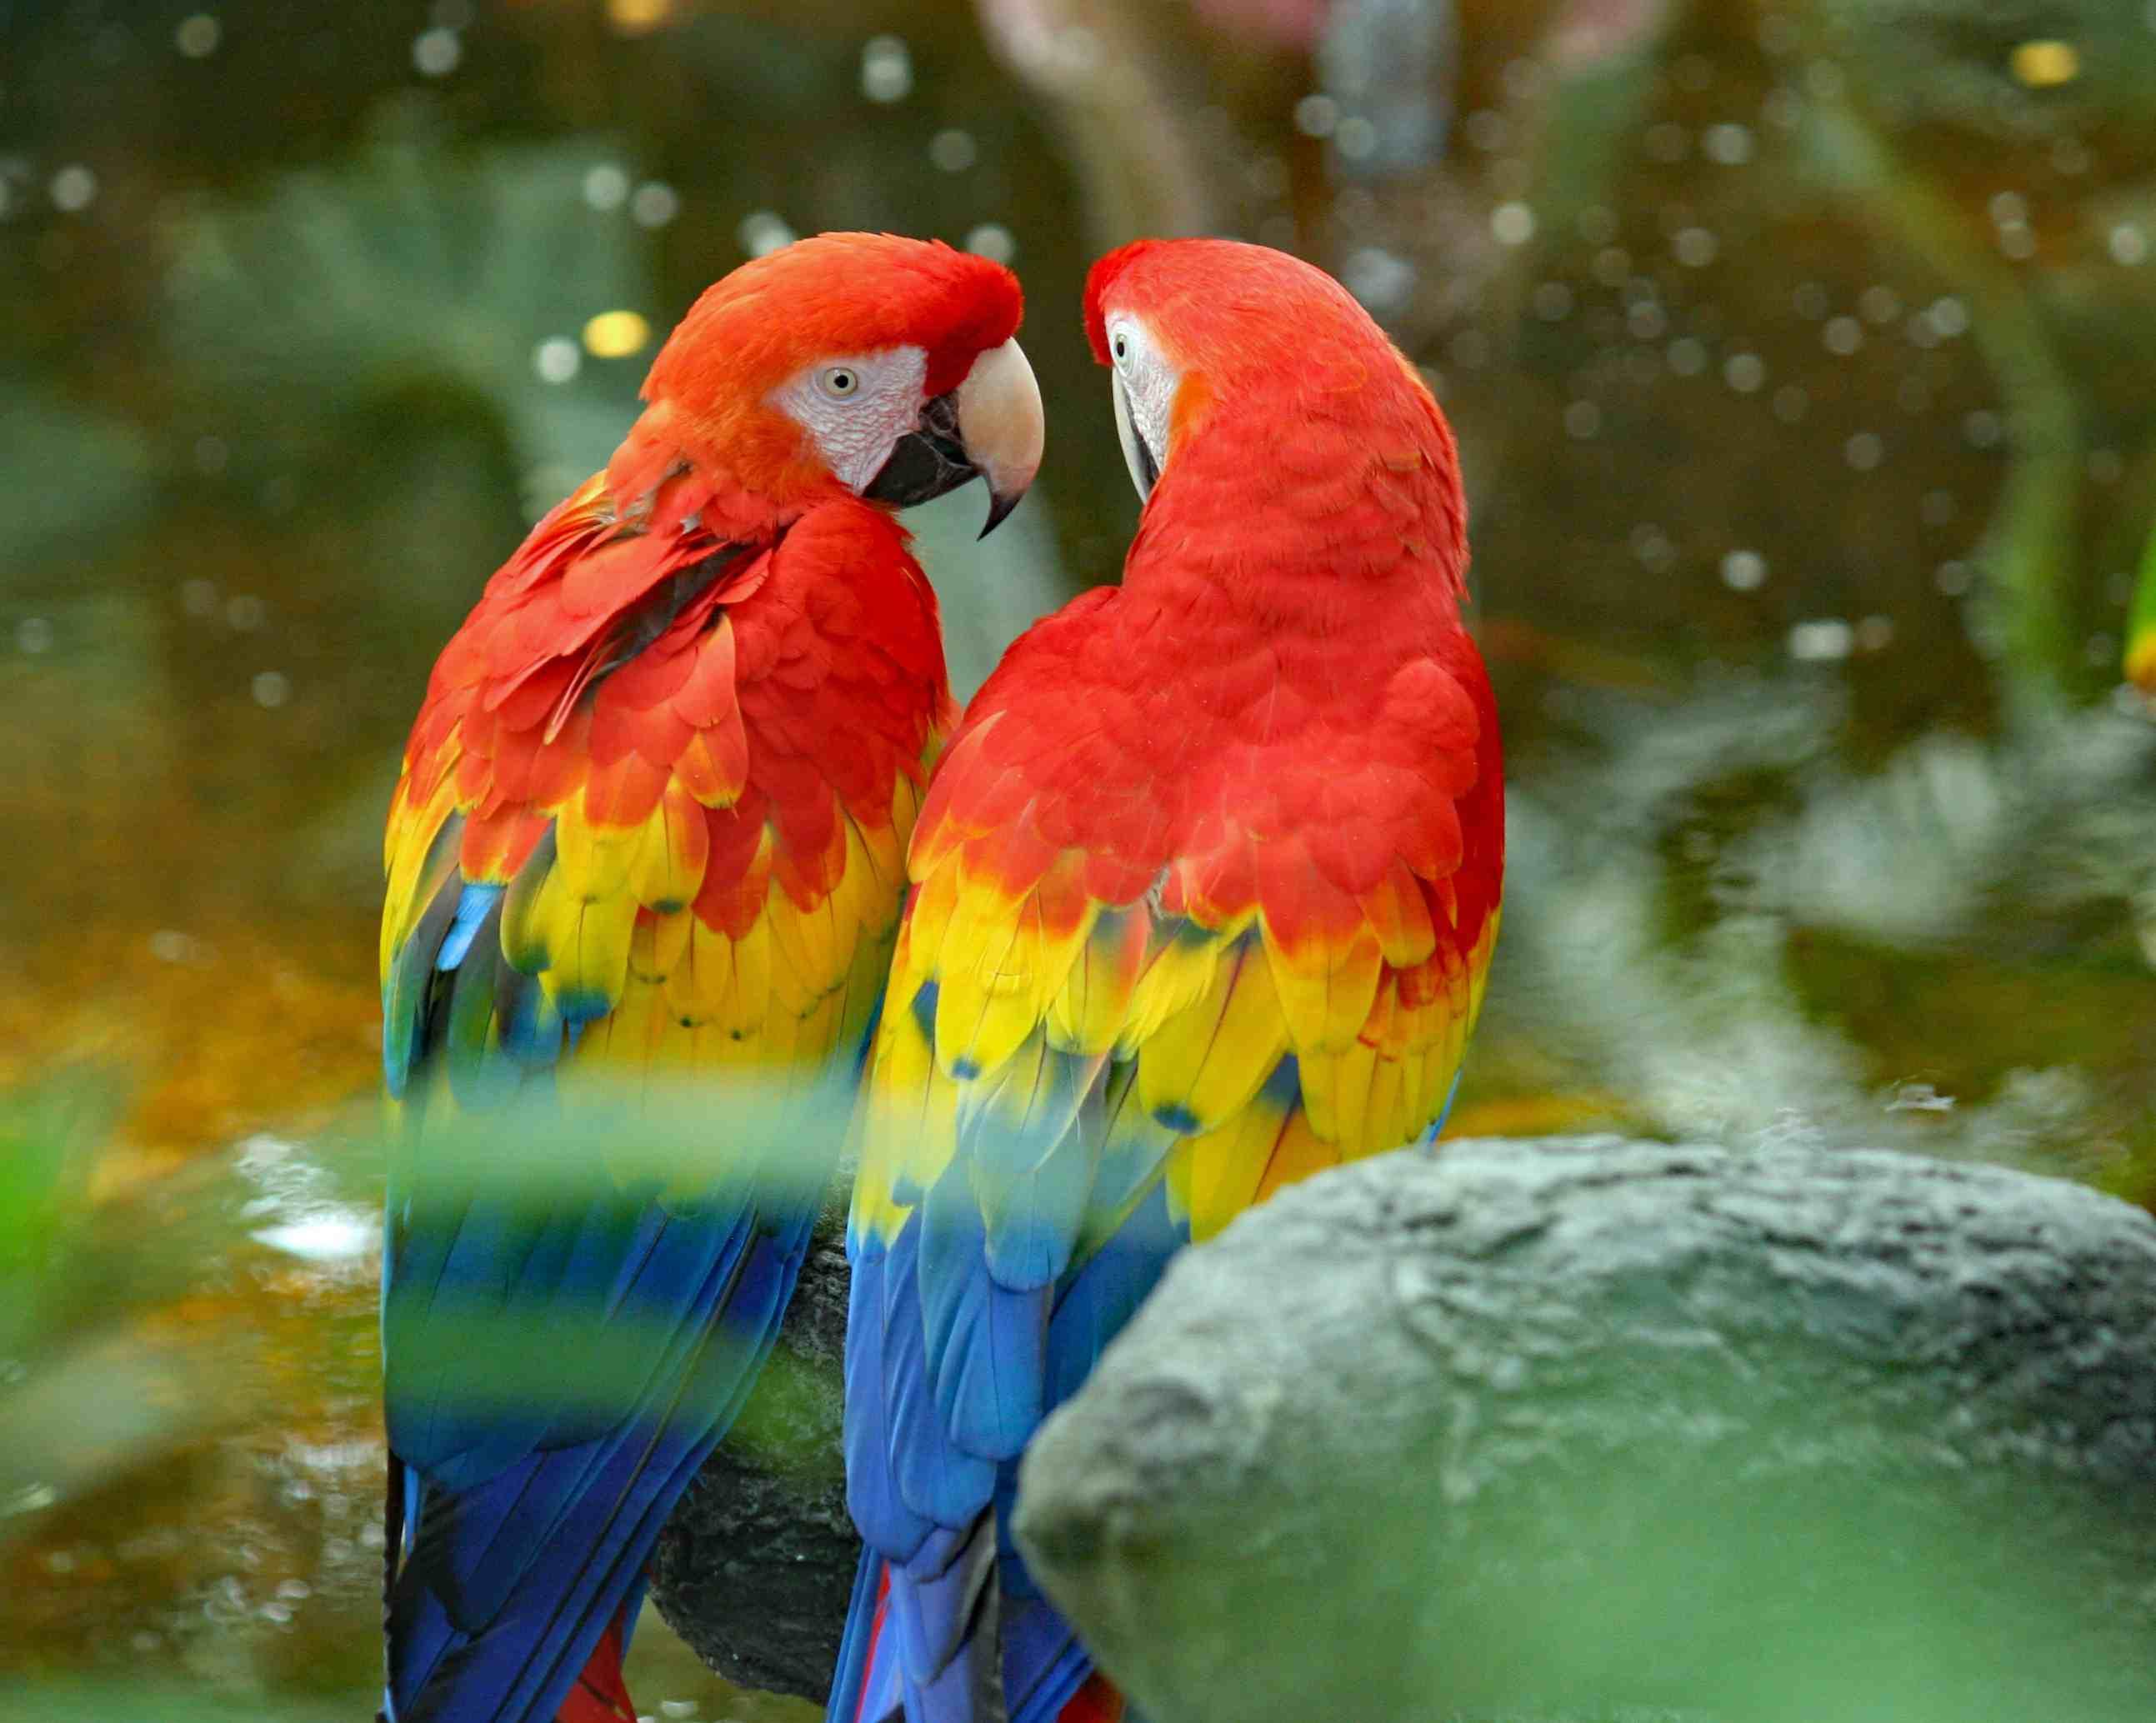 10 Most Colorful Parrot Species